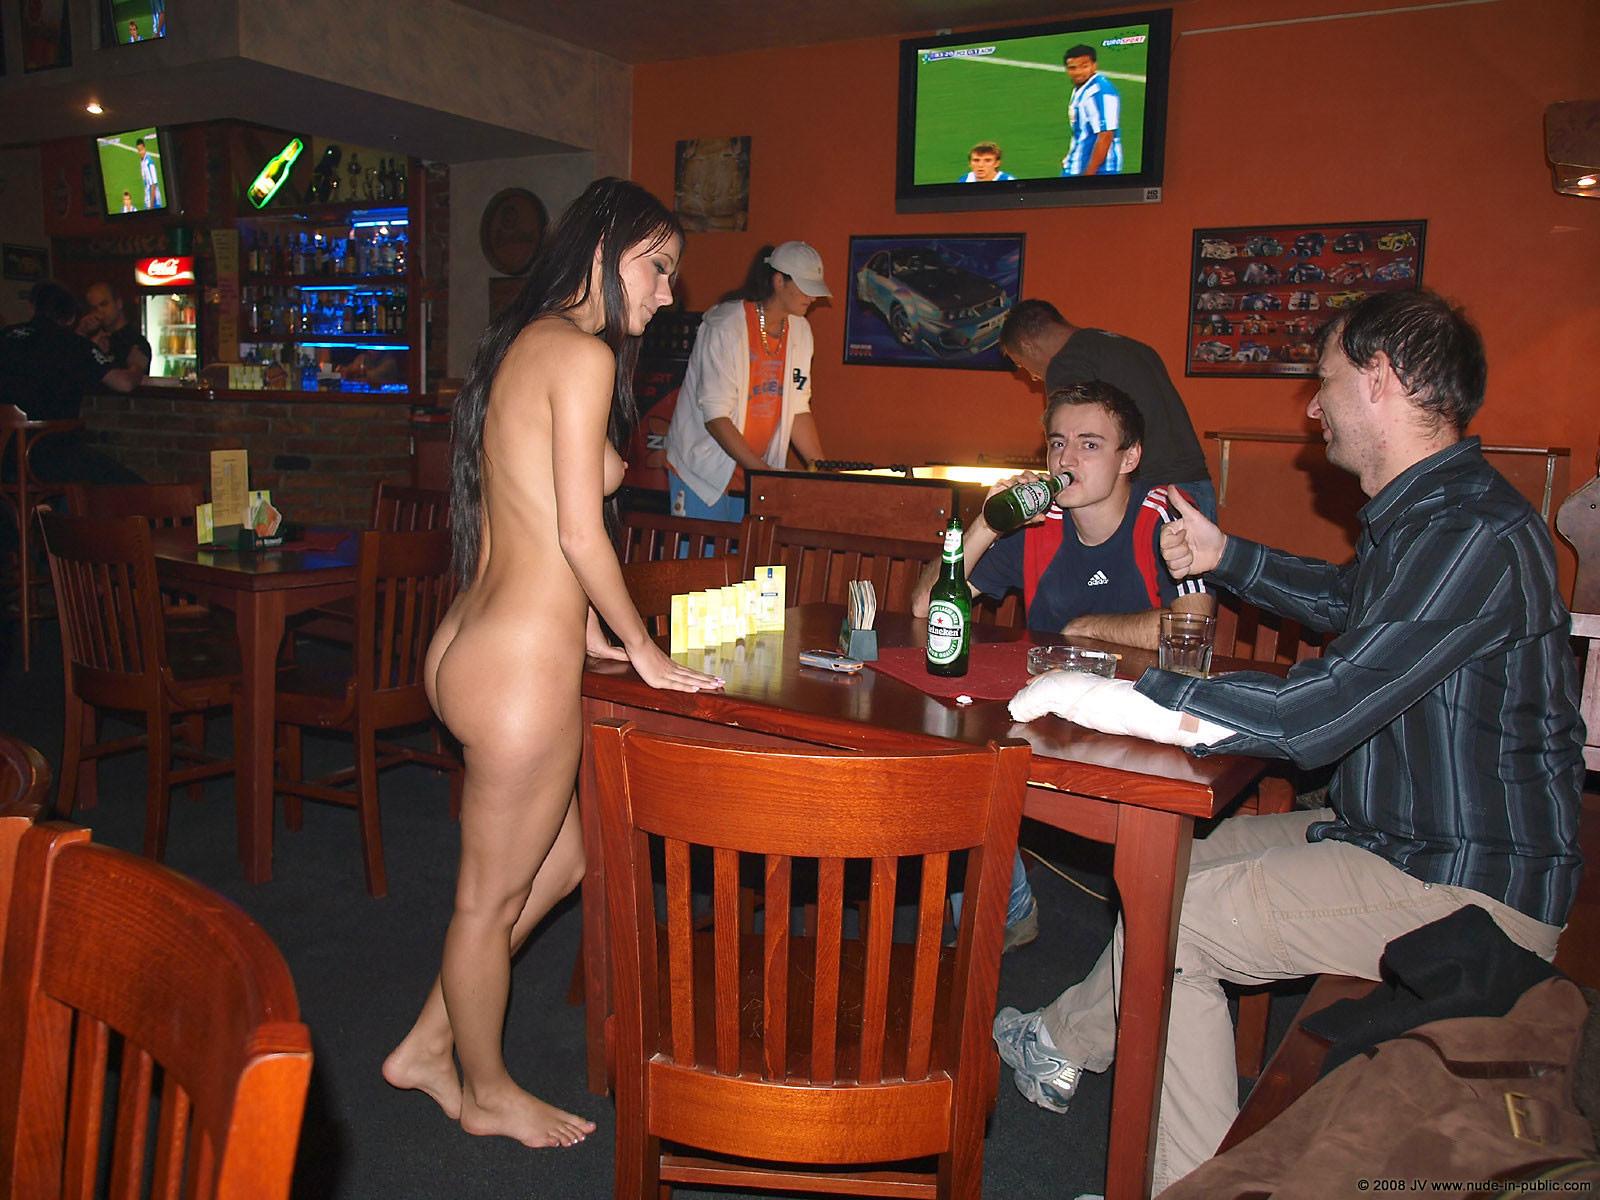 melisa-pub-beer-bar-girl-nude-in-public-05